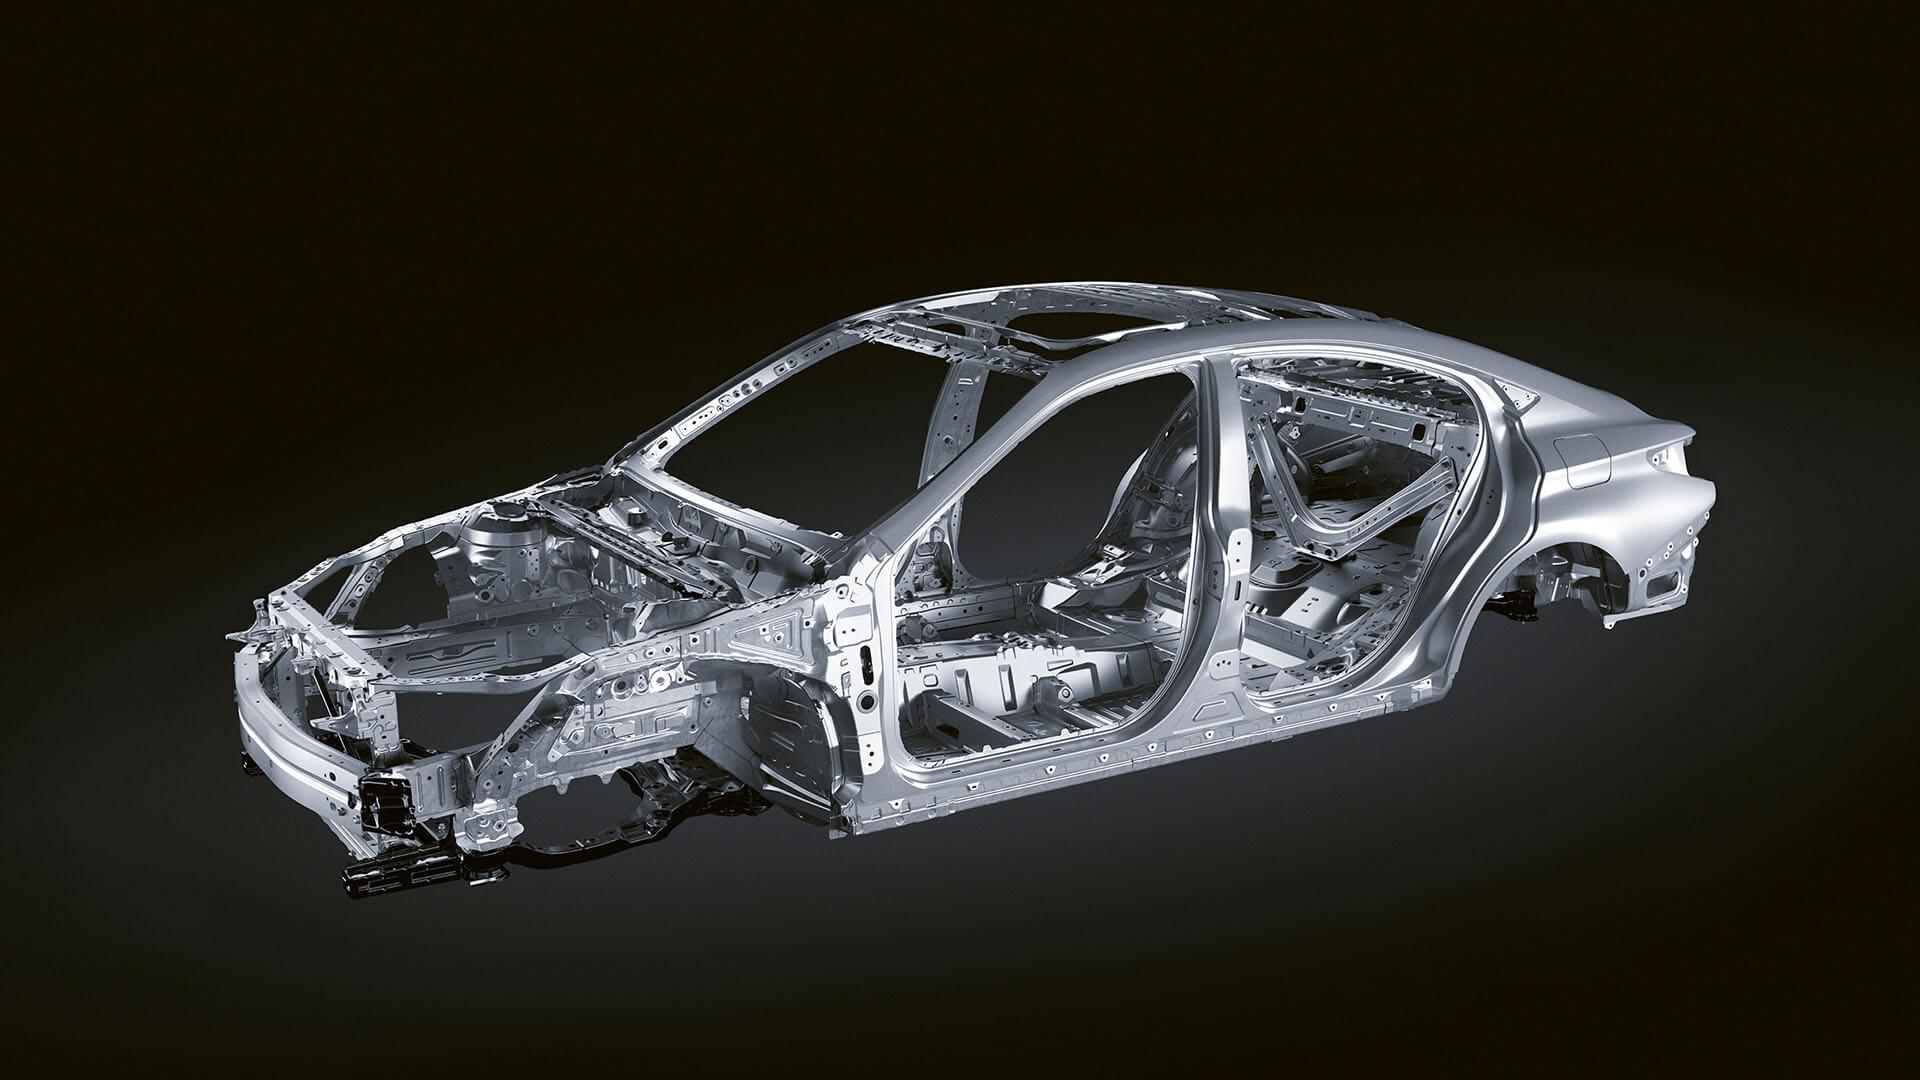 2022 lexus es experience exterior back high rigidity lightweight body